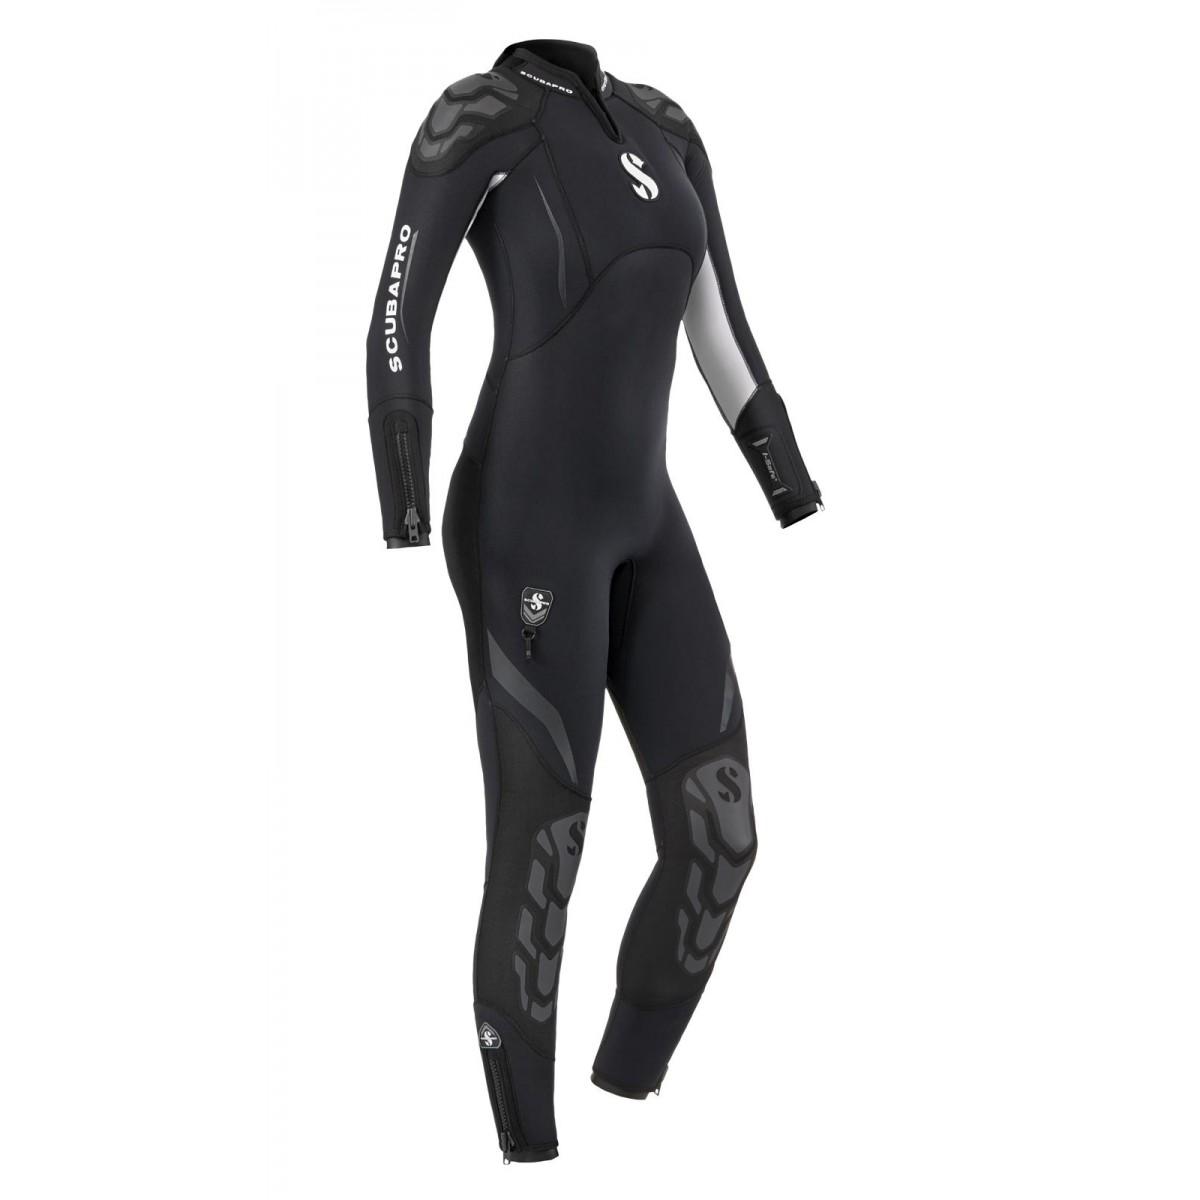 Scubapro Women's EVERFLEX 7/5mm Wetsuit